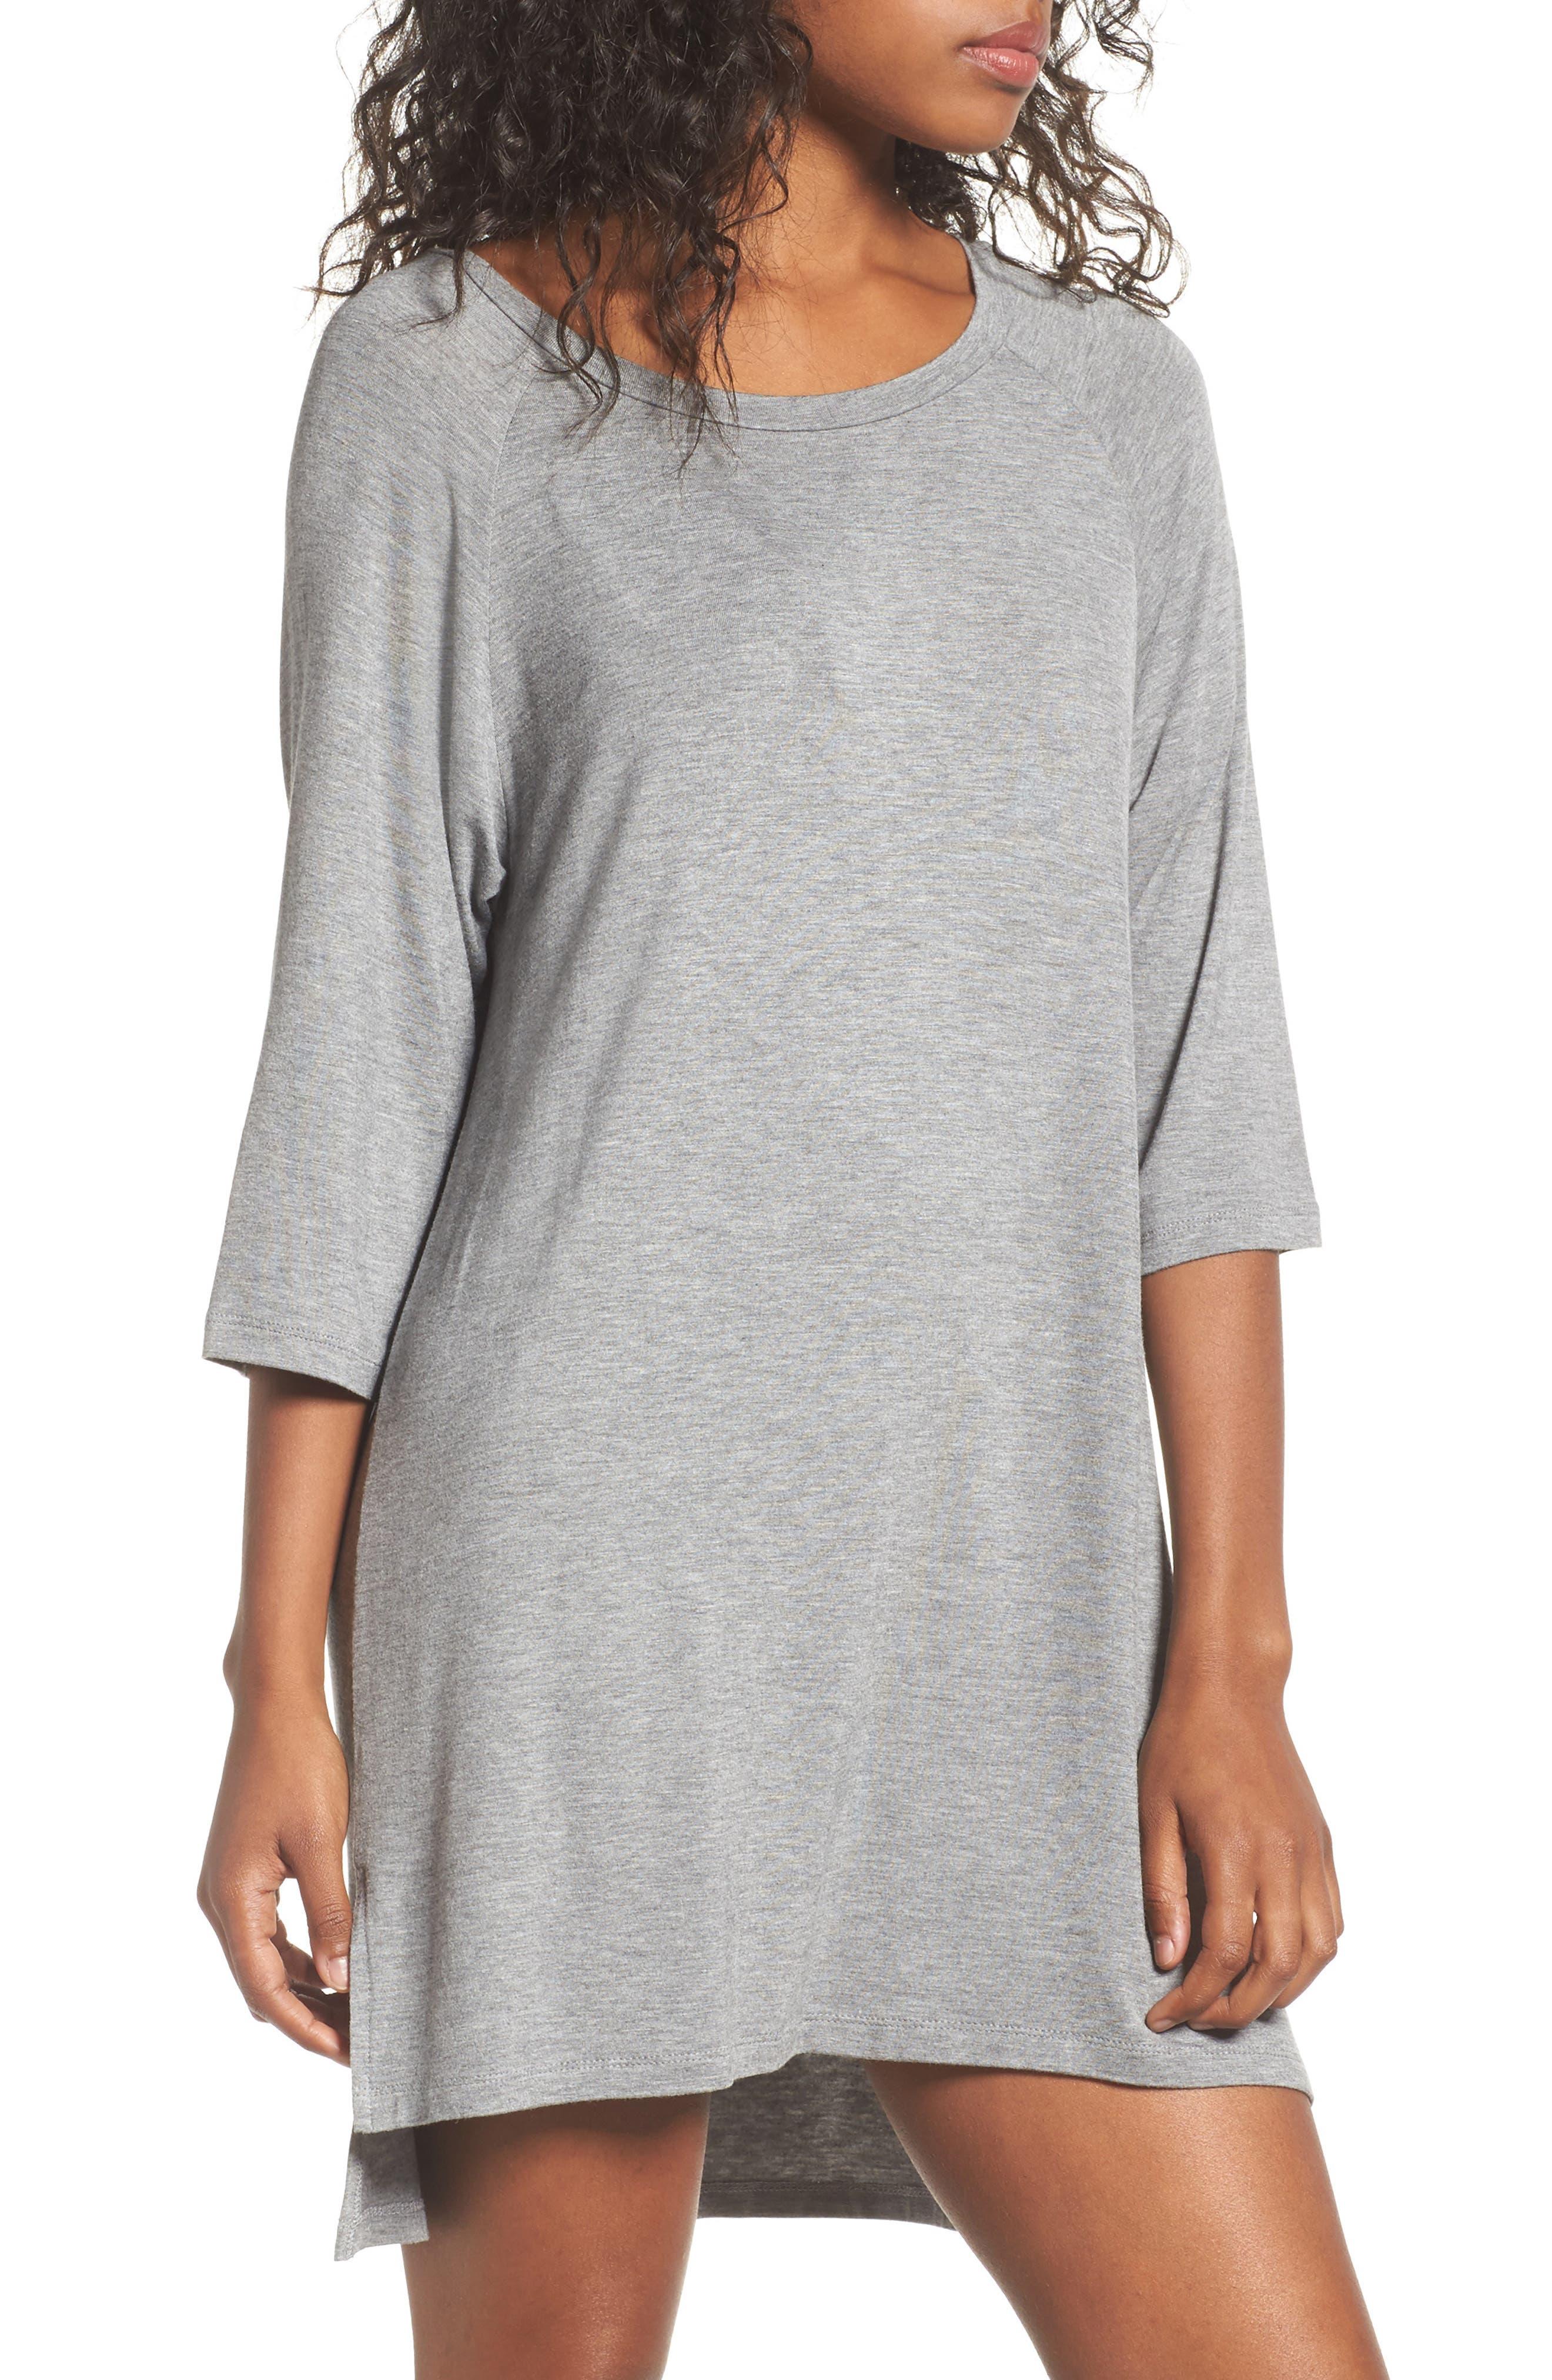 Honeydew All American Sleep Shirt (2 for $60)